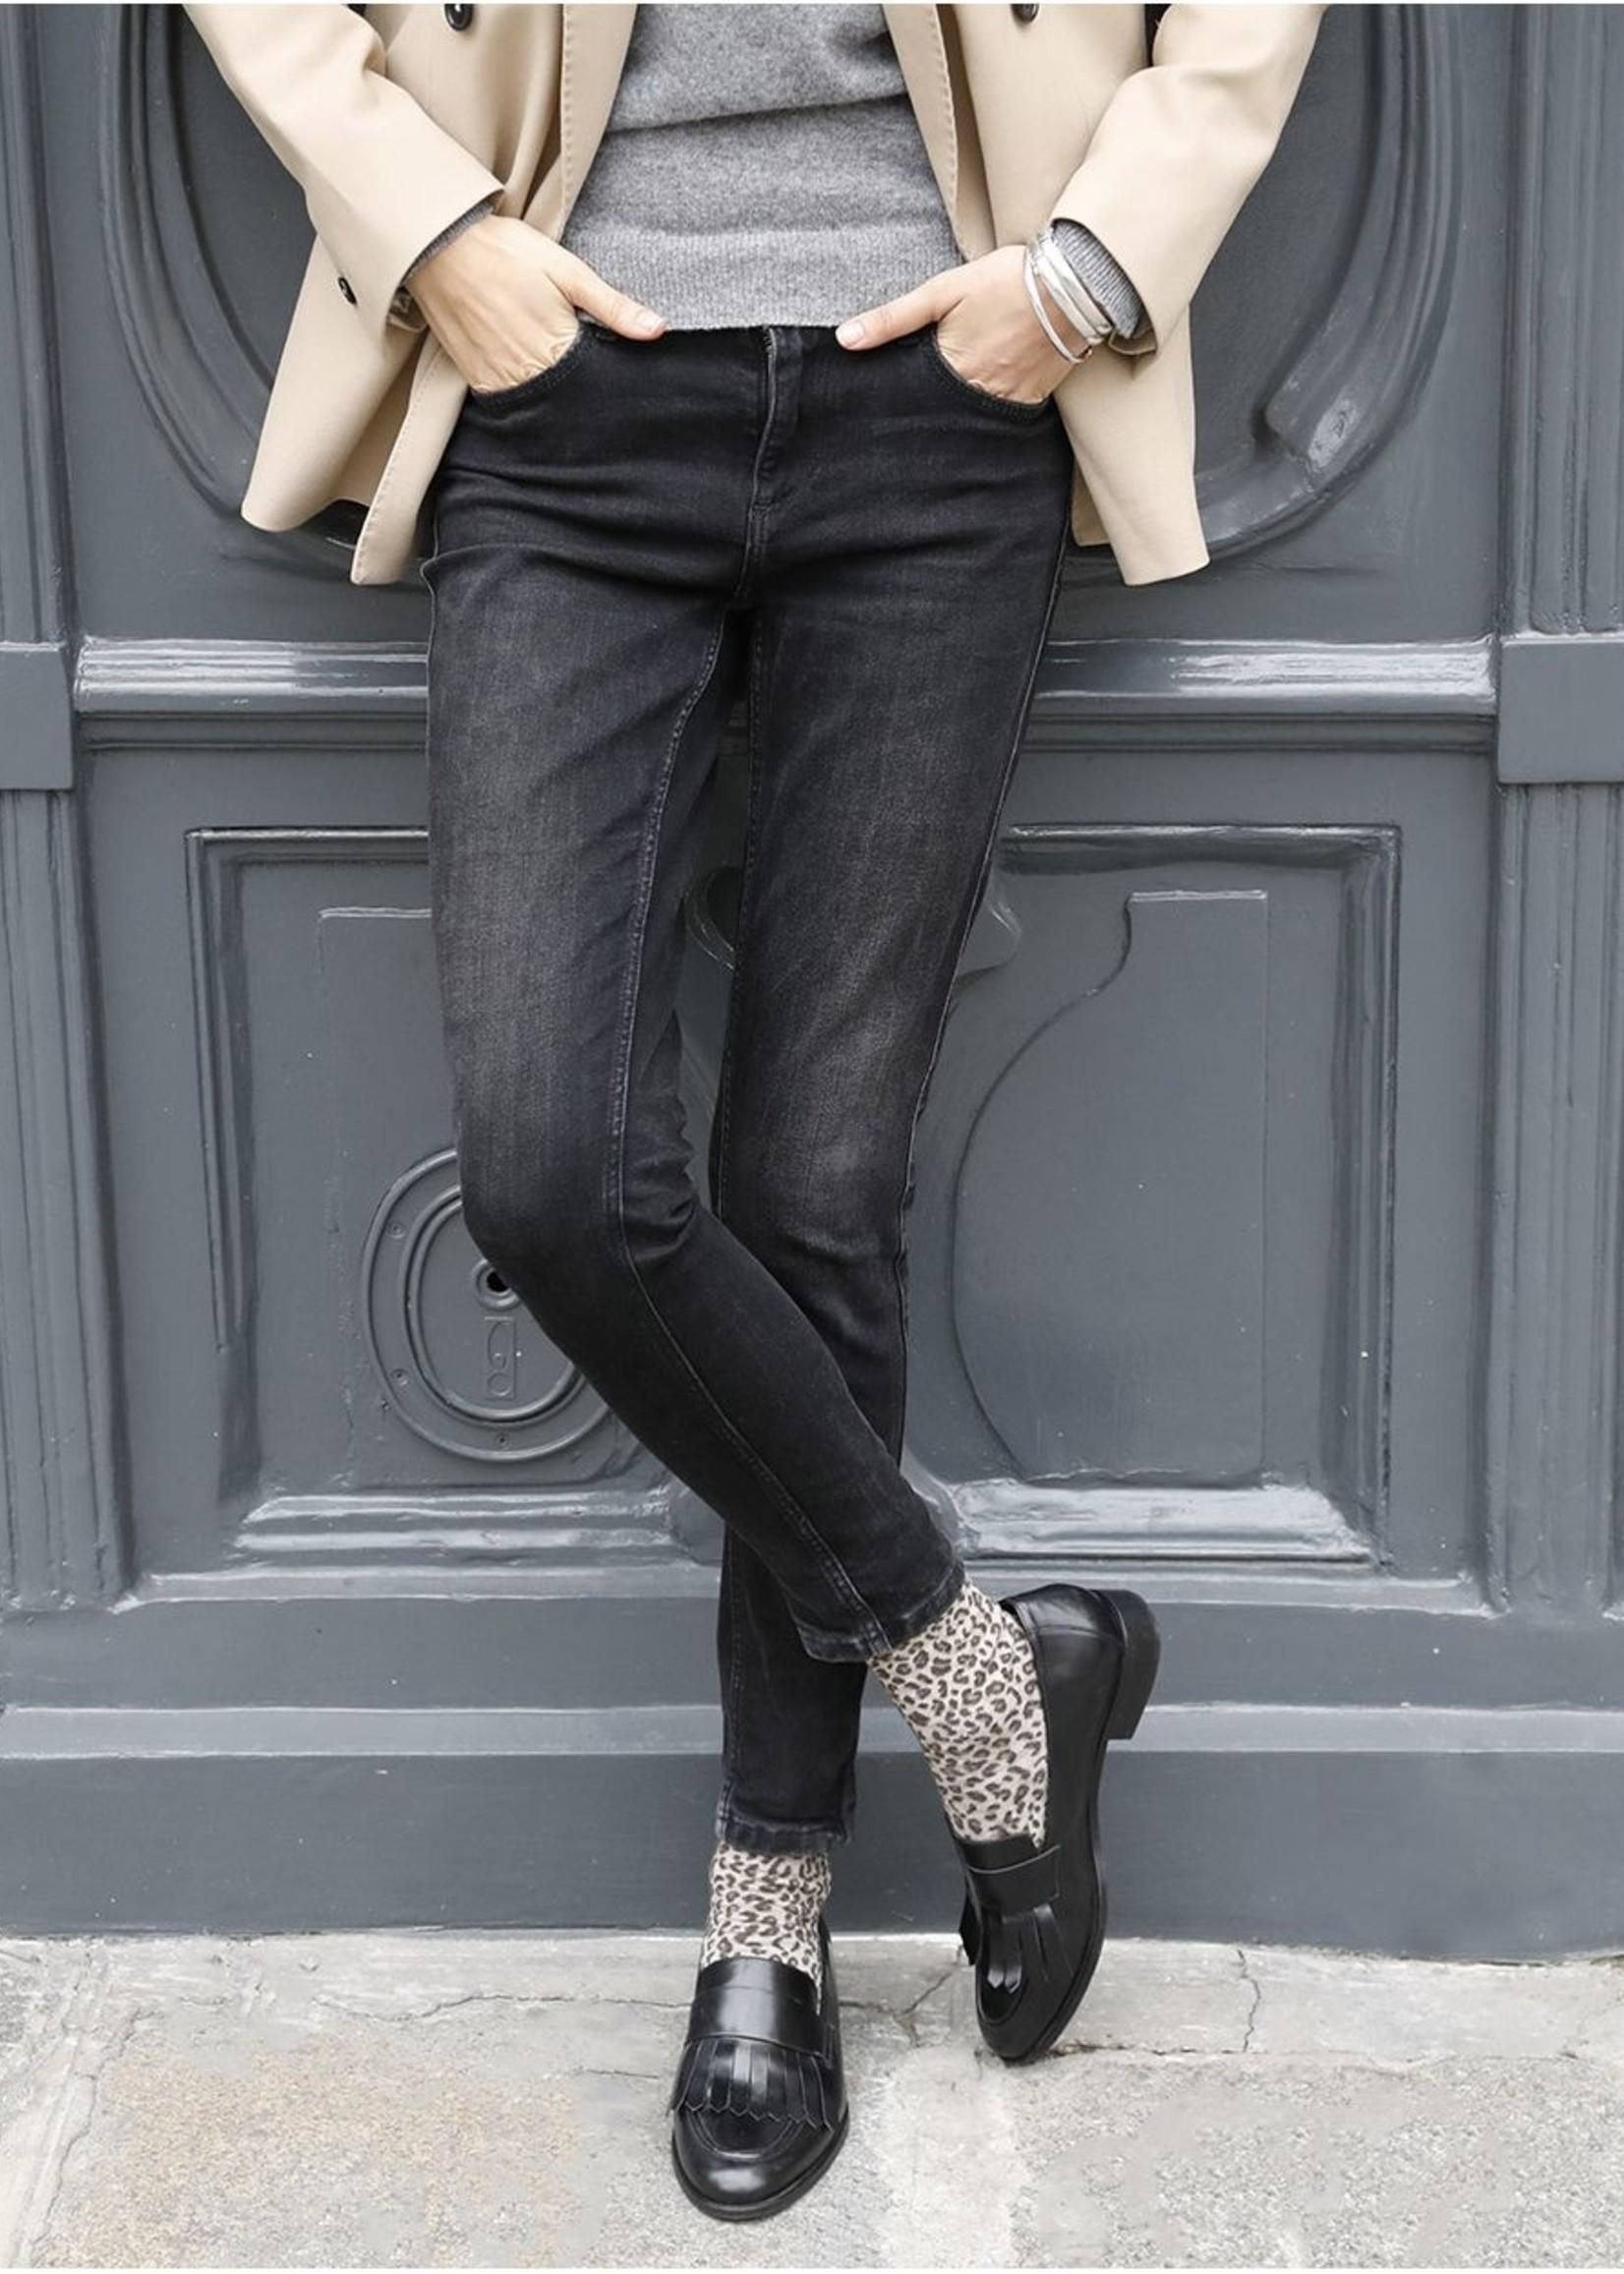 Bleuforet Merino Wool Leopard Socks